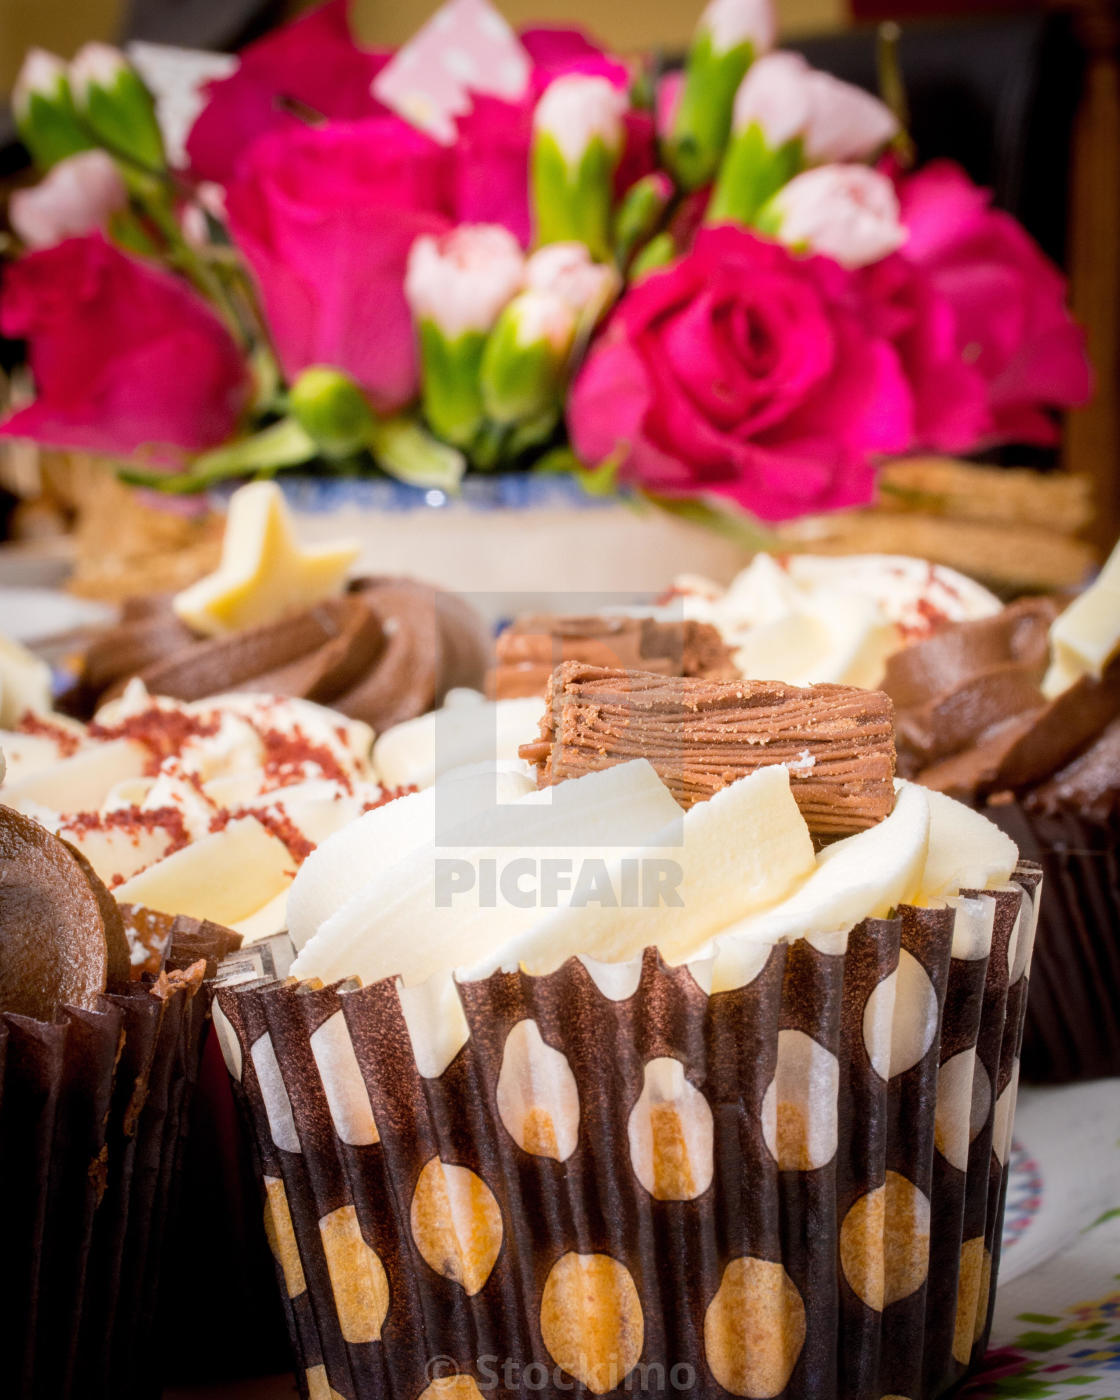 Birthday Cakes Stock Image